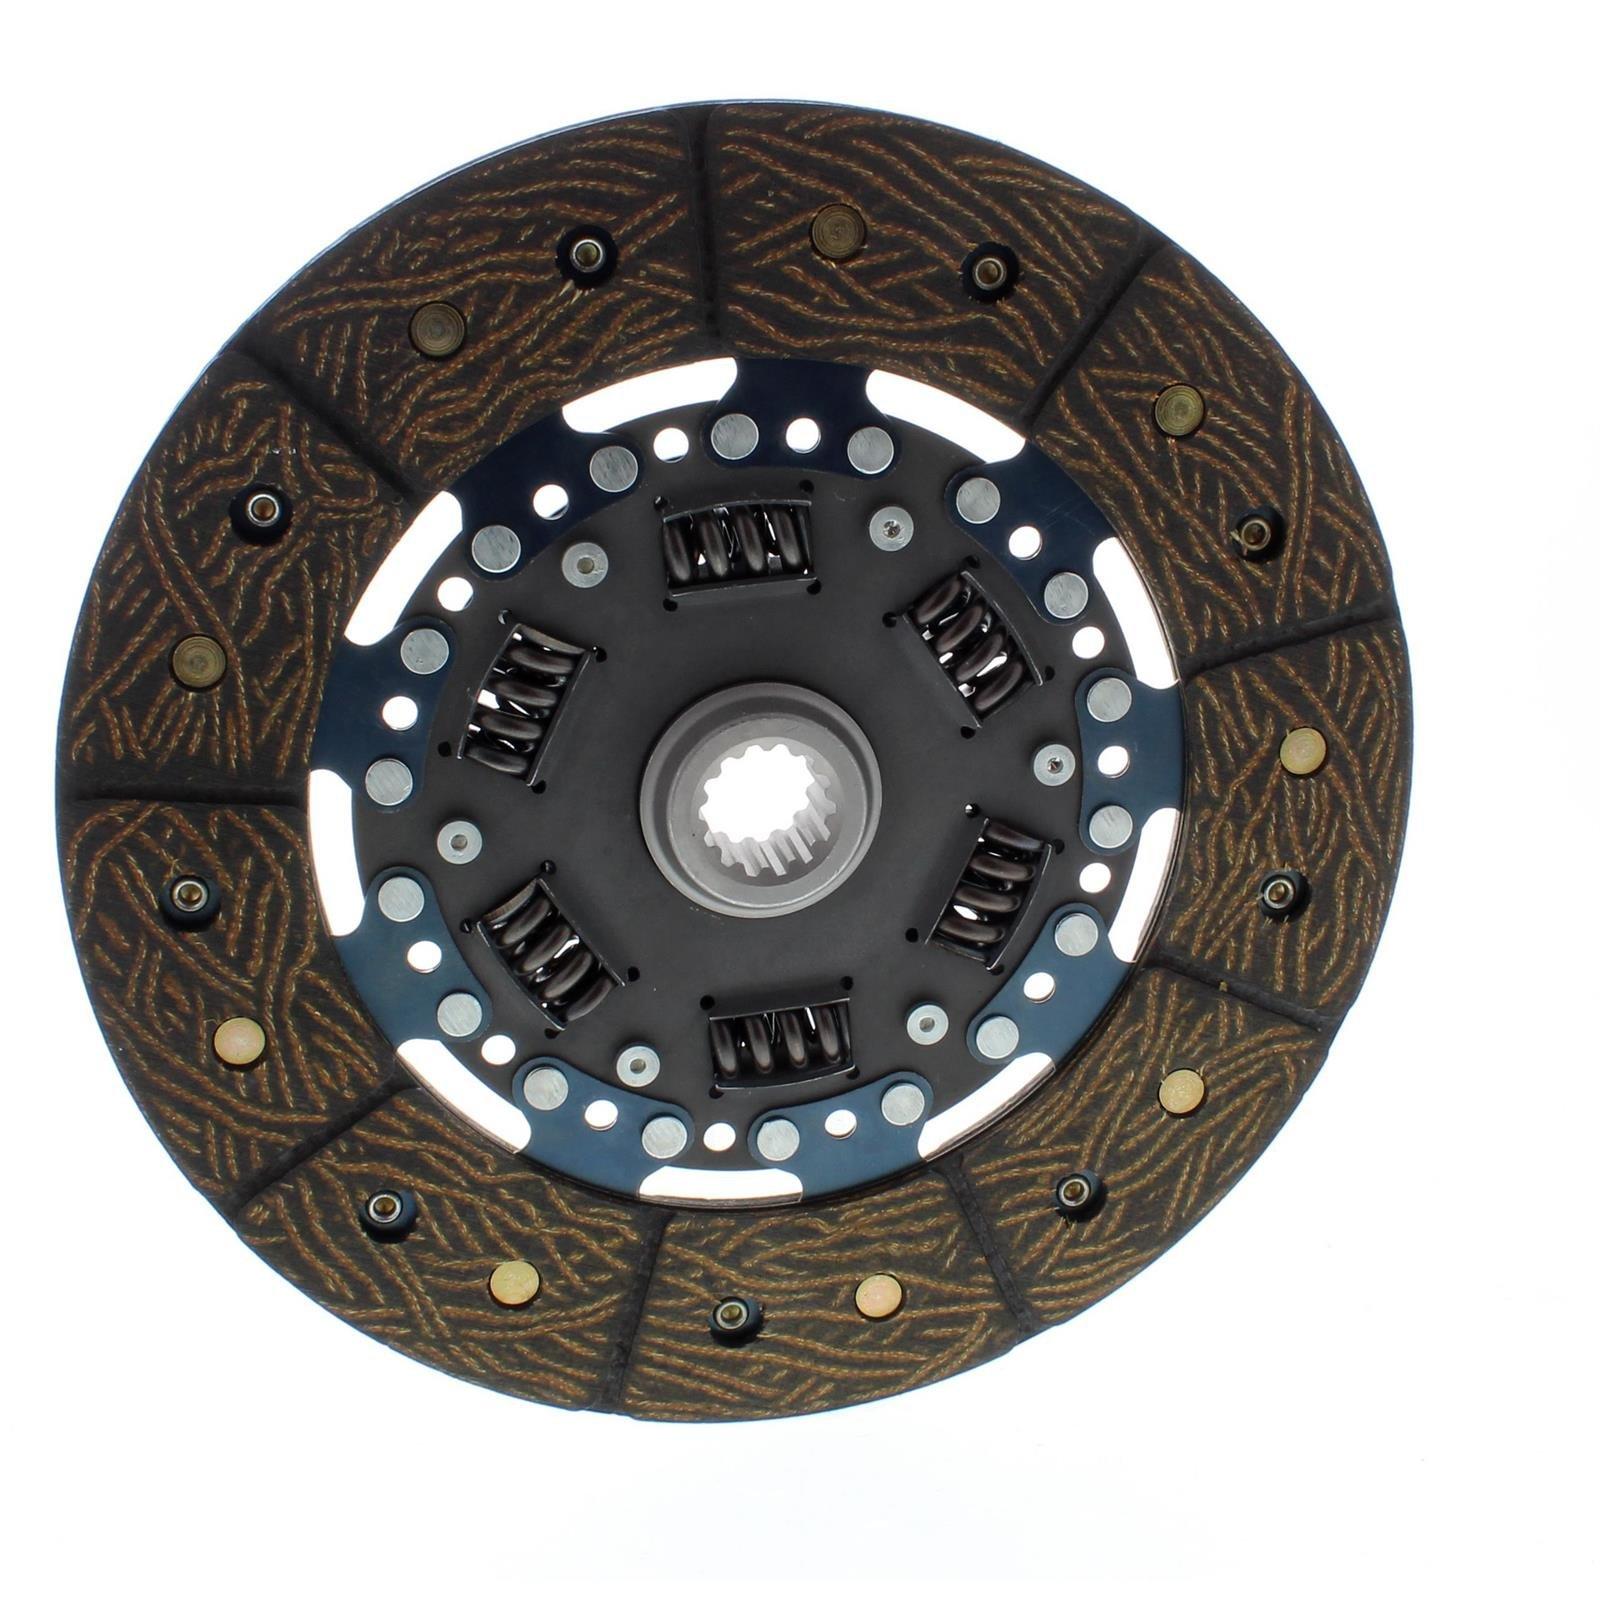 Flathead 10 Inch Clutch Disc, 1 Inch 14-Spline, S-10, T-5 Transmission